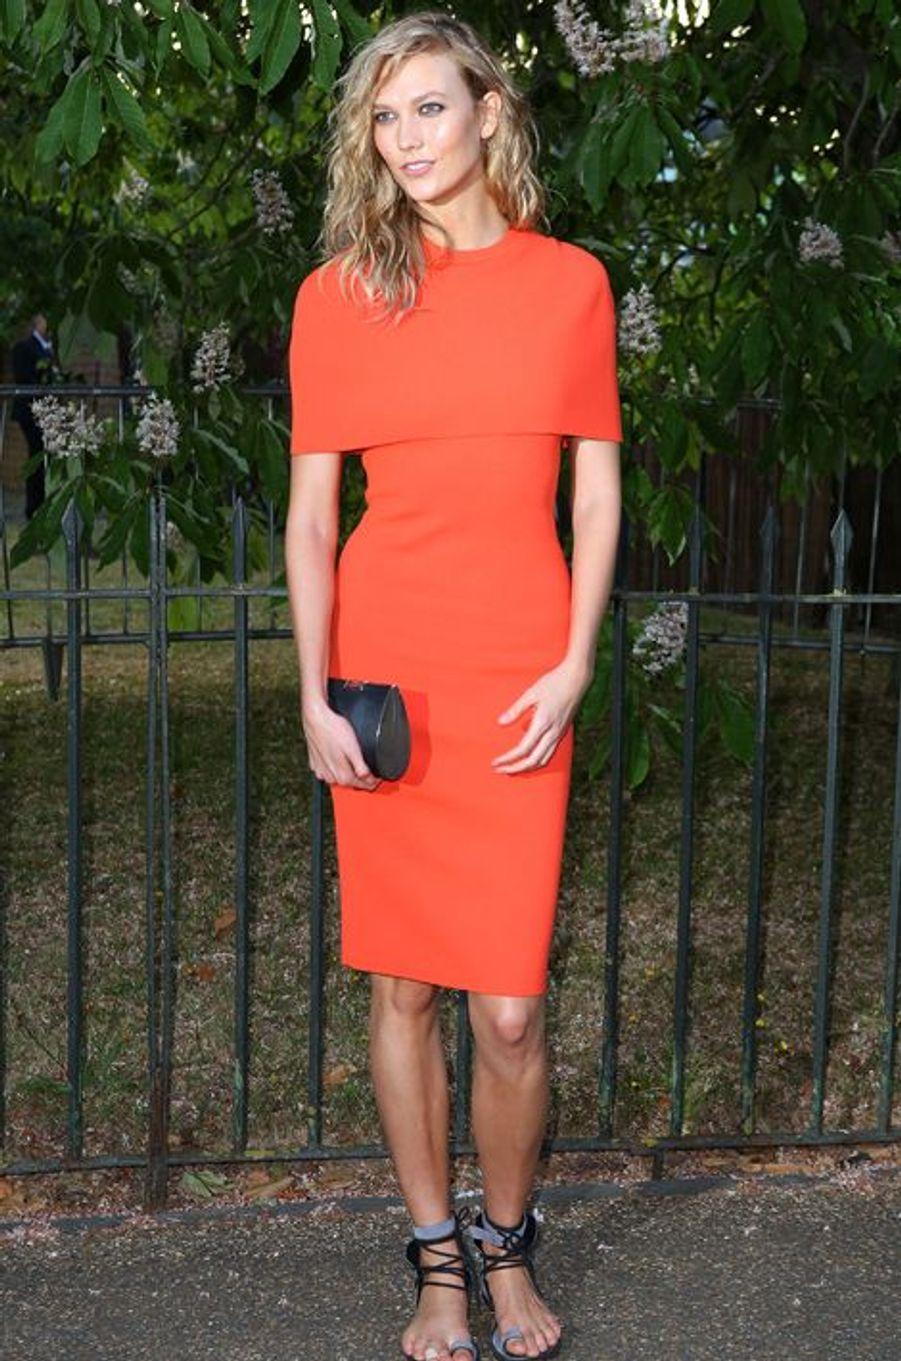 Karlie Kloss à Londres le 2 juillet 2015